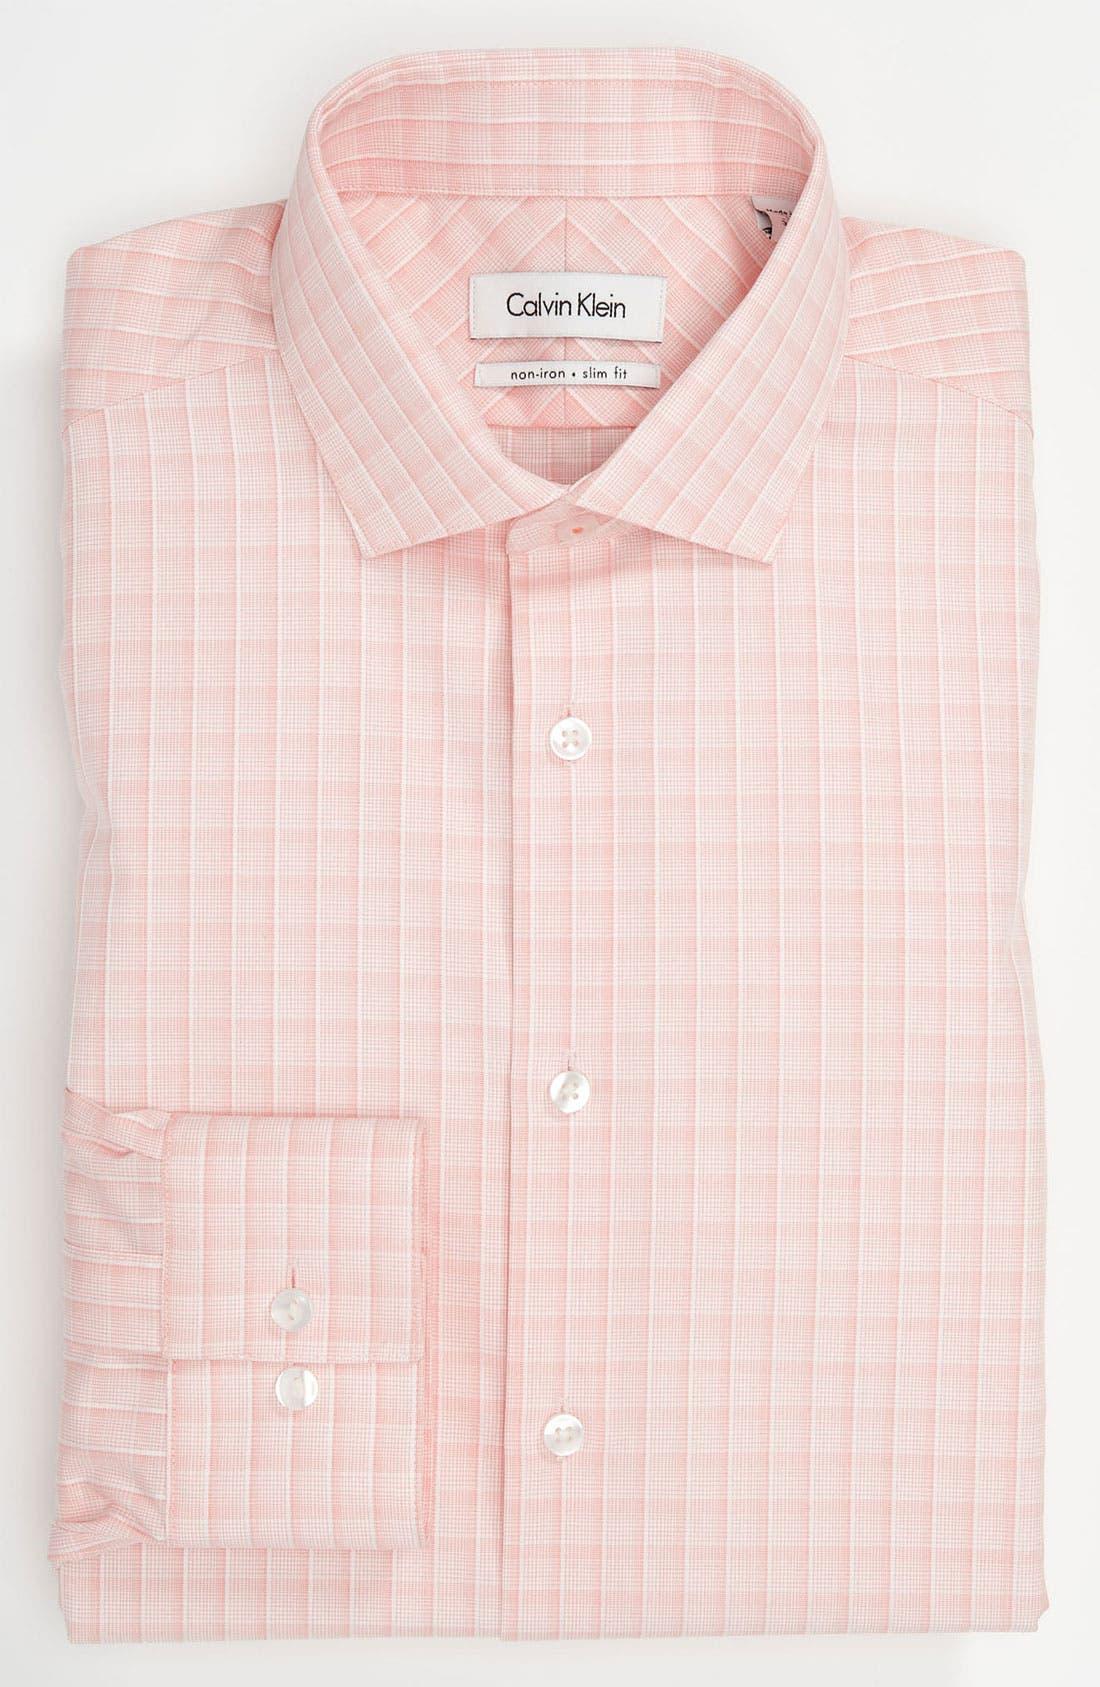 Main Image - Calvin Klein 'Montecarlo Check' Slim Fit Dress Shirt